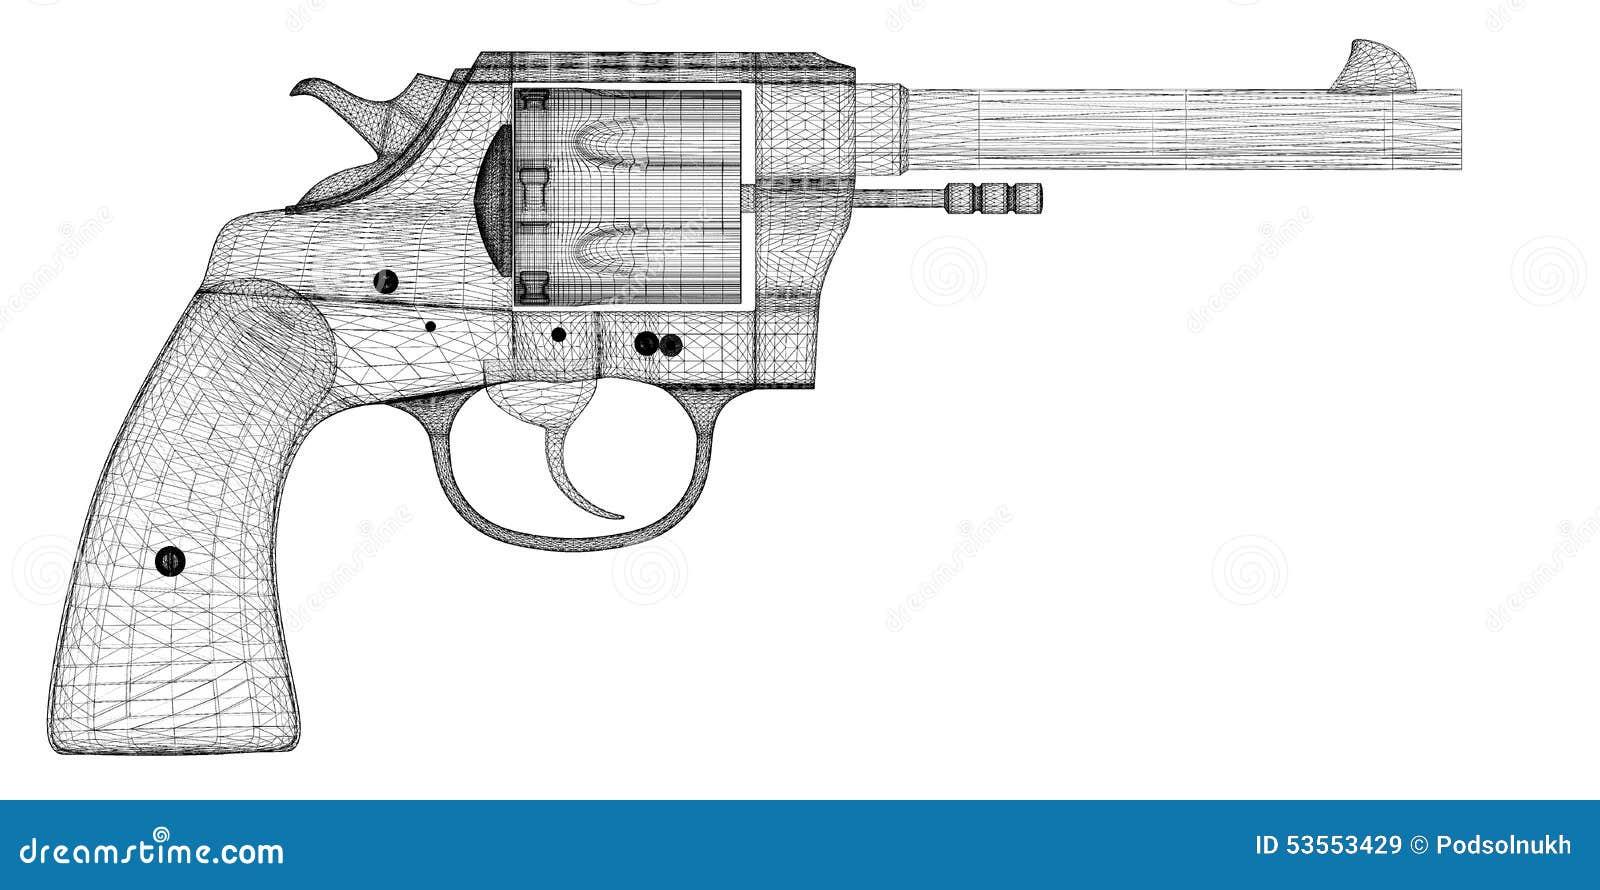 how to make original gun